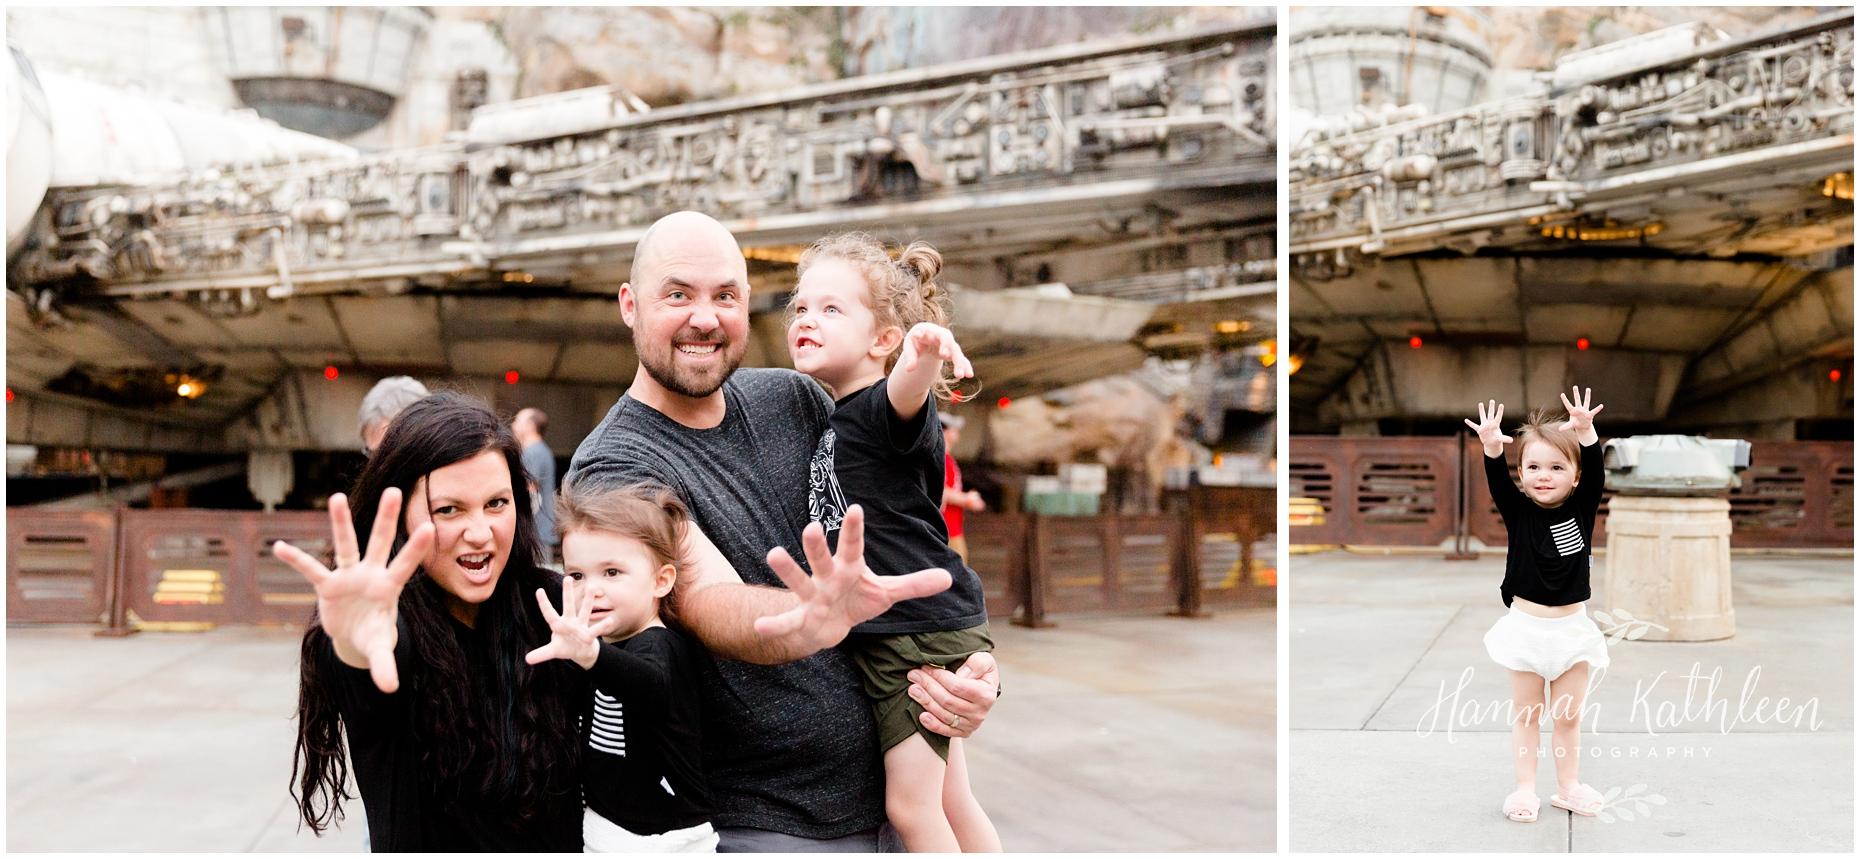 Disney_World_Disneyland_Hollywood_Studios_Galaxys_Edge_Family_Photographer